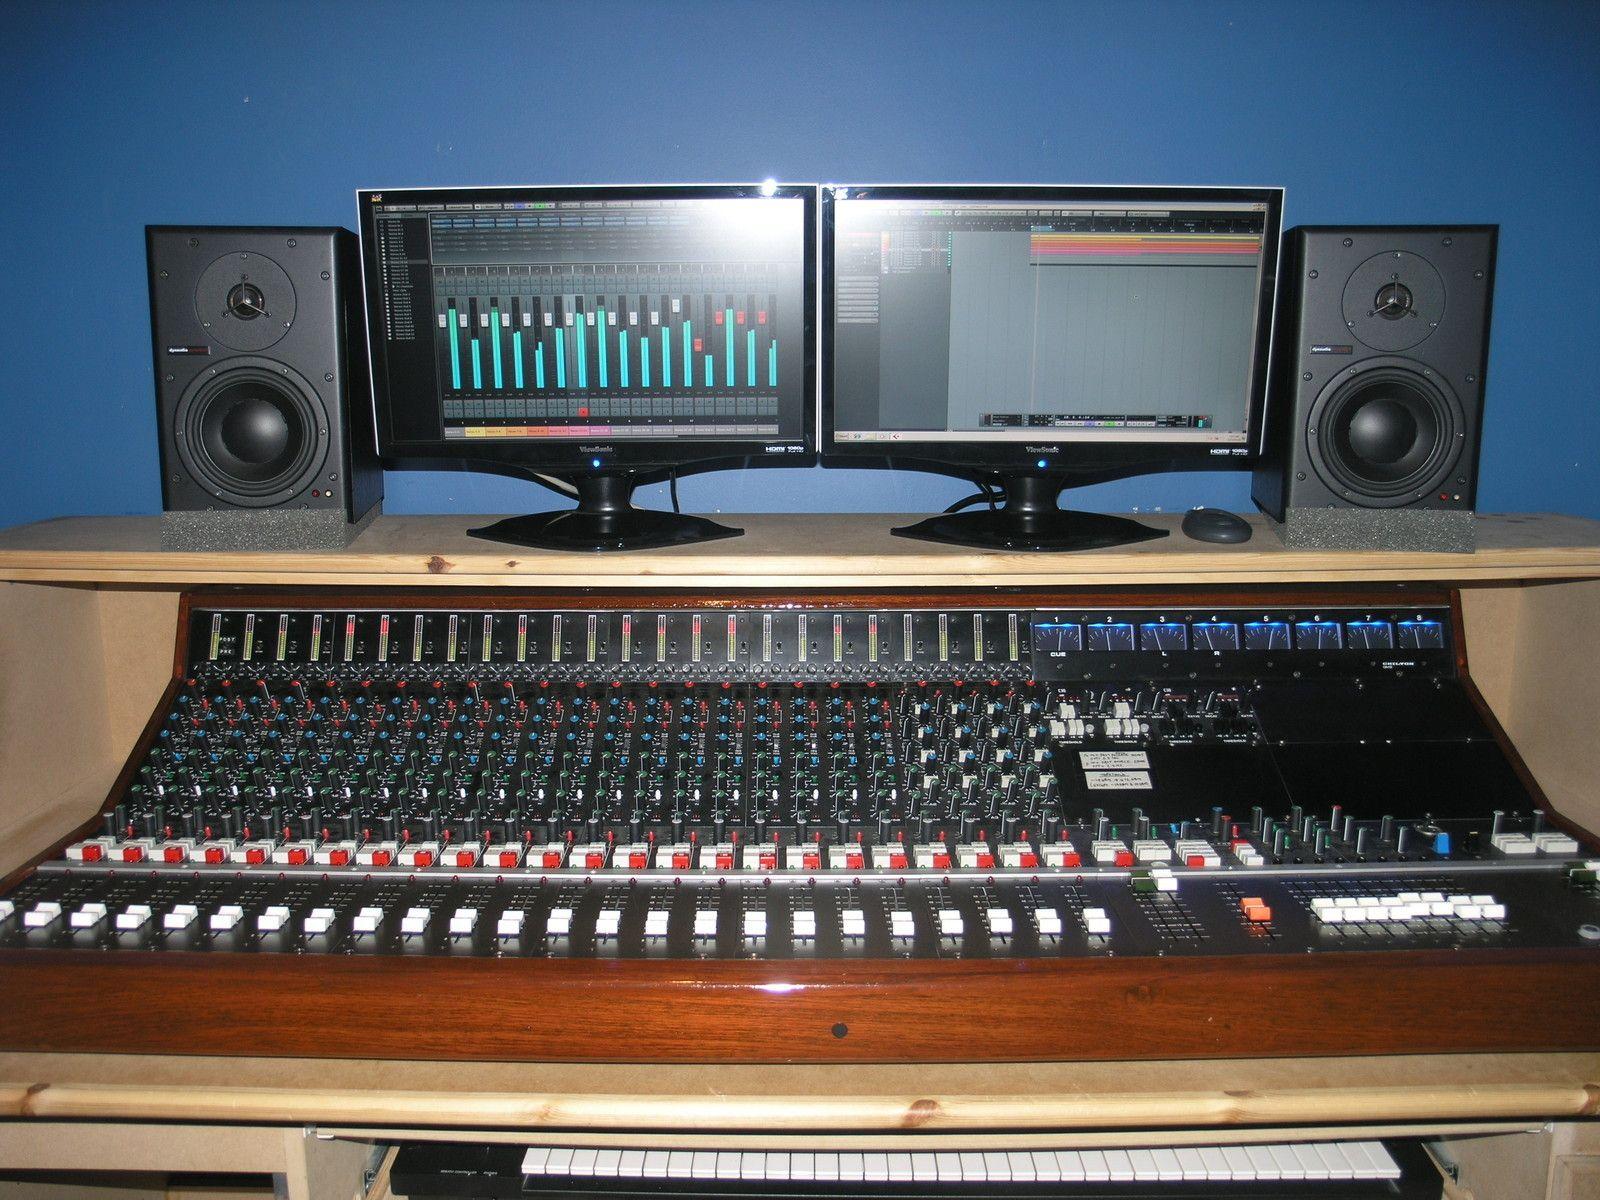 Chilton Qm3 24 8 2 Mixing Console Mixer Desk Like Api Neve Calrec Audix Studio Setupstudio